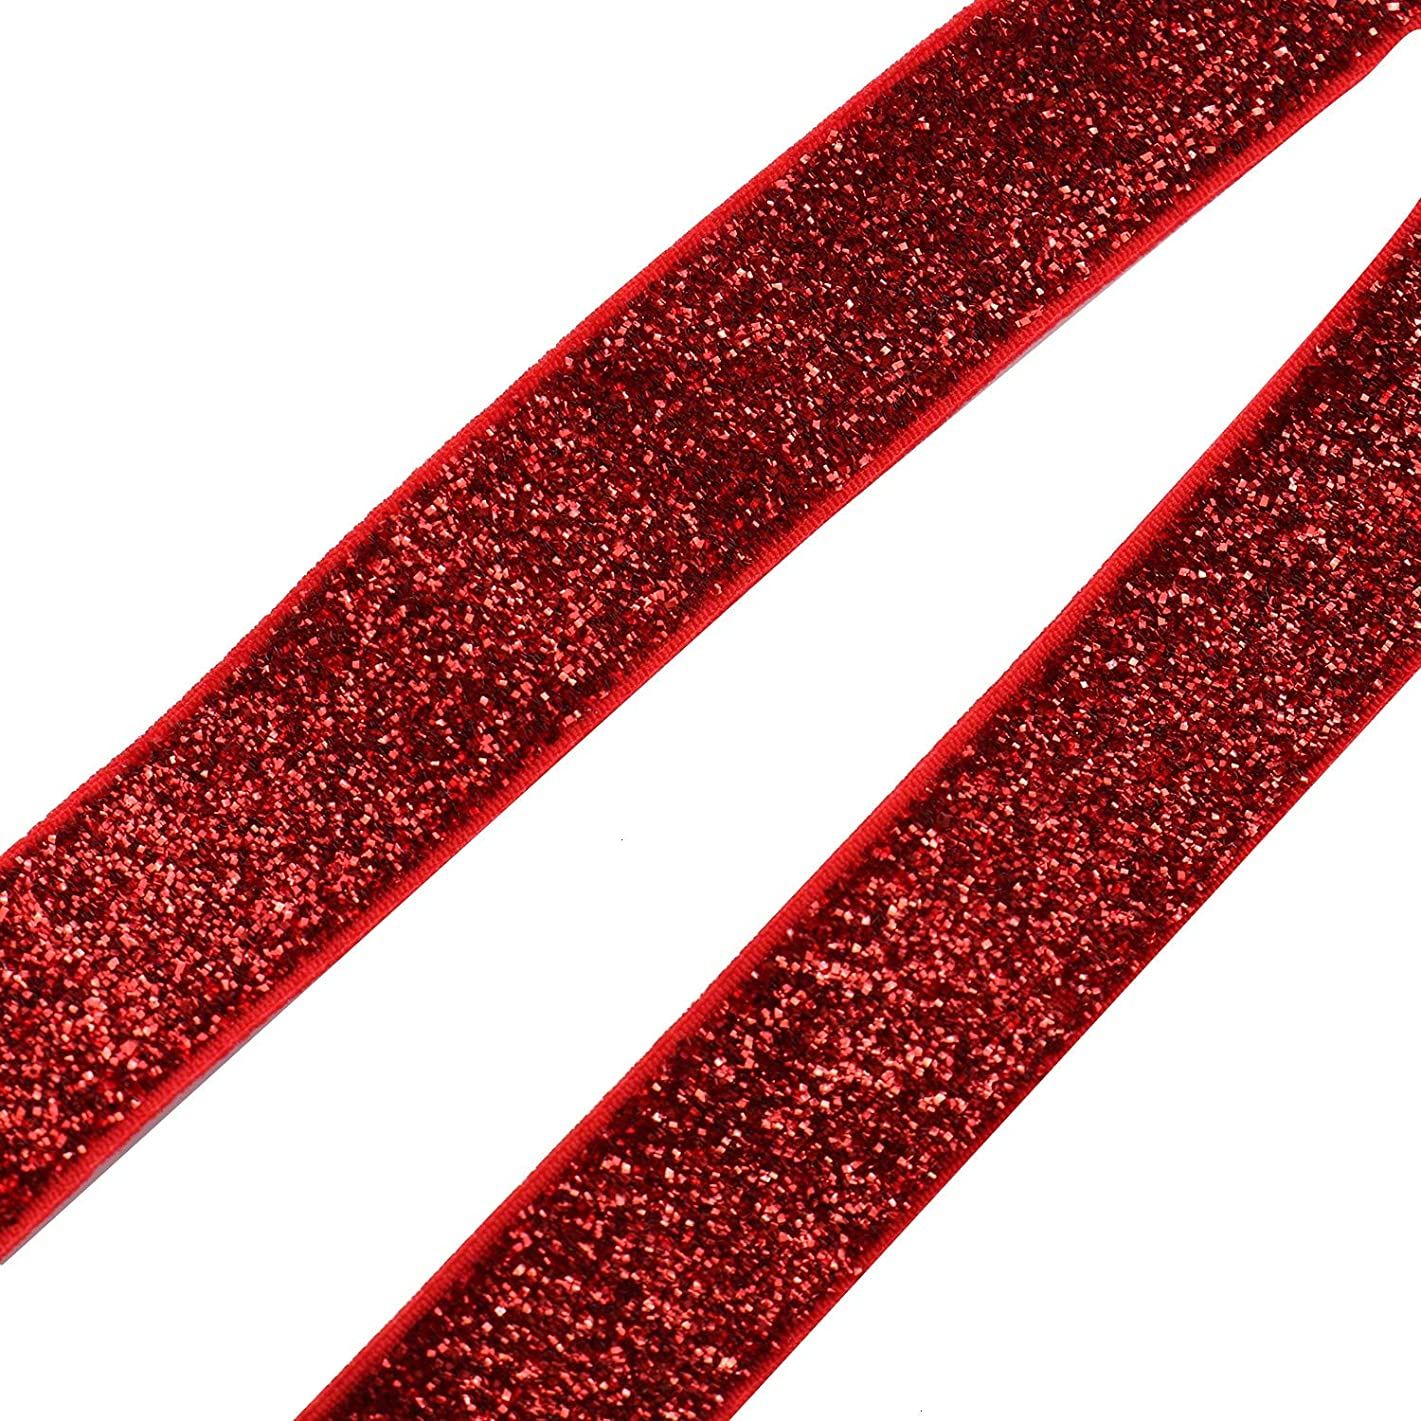 Monrocco 5 Yards Glitter Elastic Ribbon Fold Over Elastic for Craft Hair Tie Headband (Red)